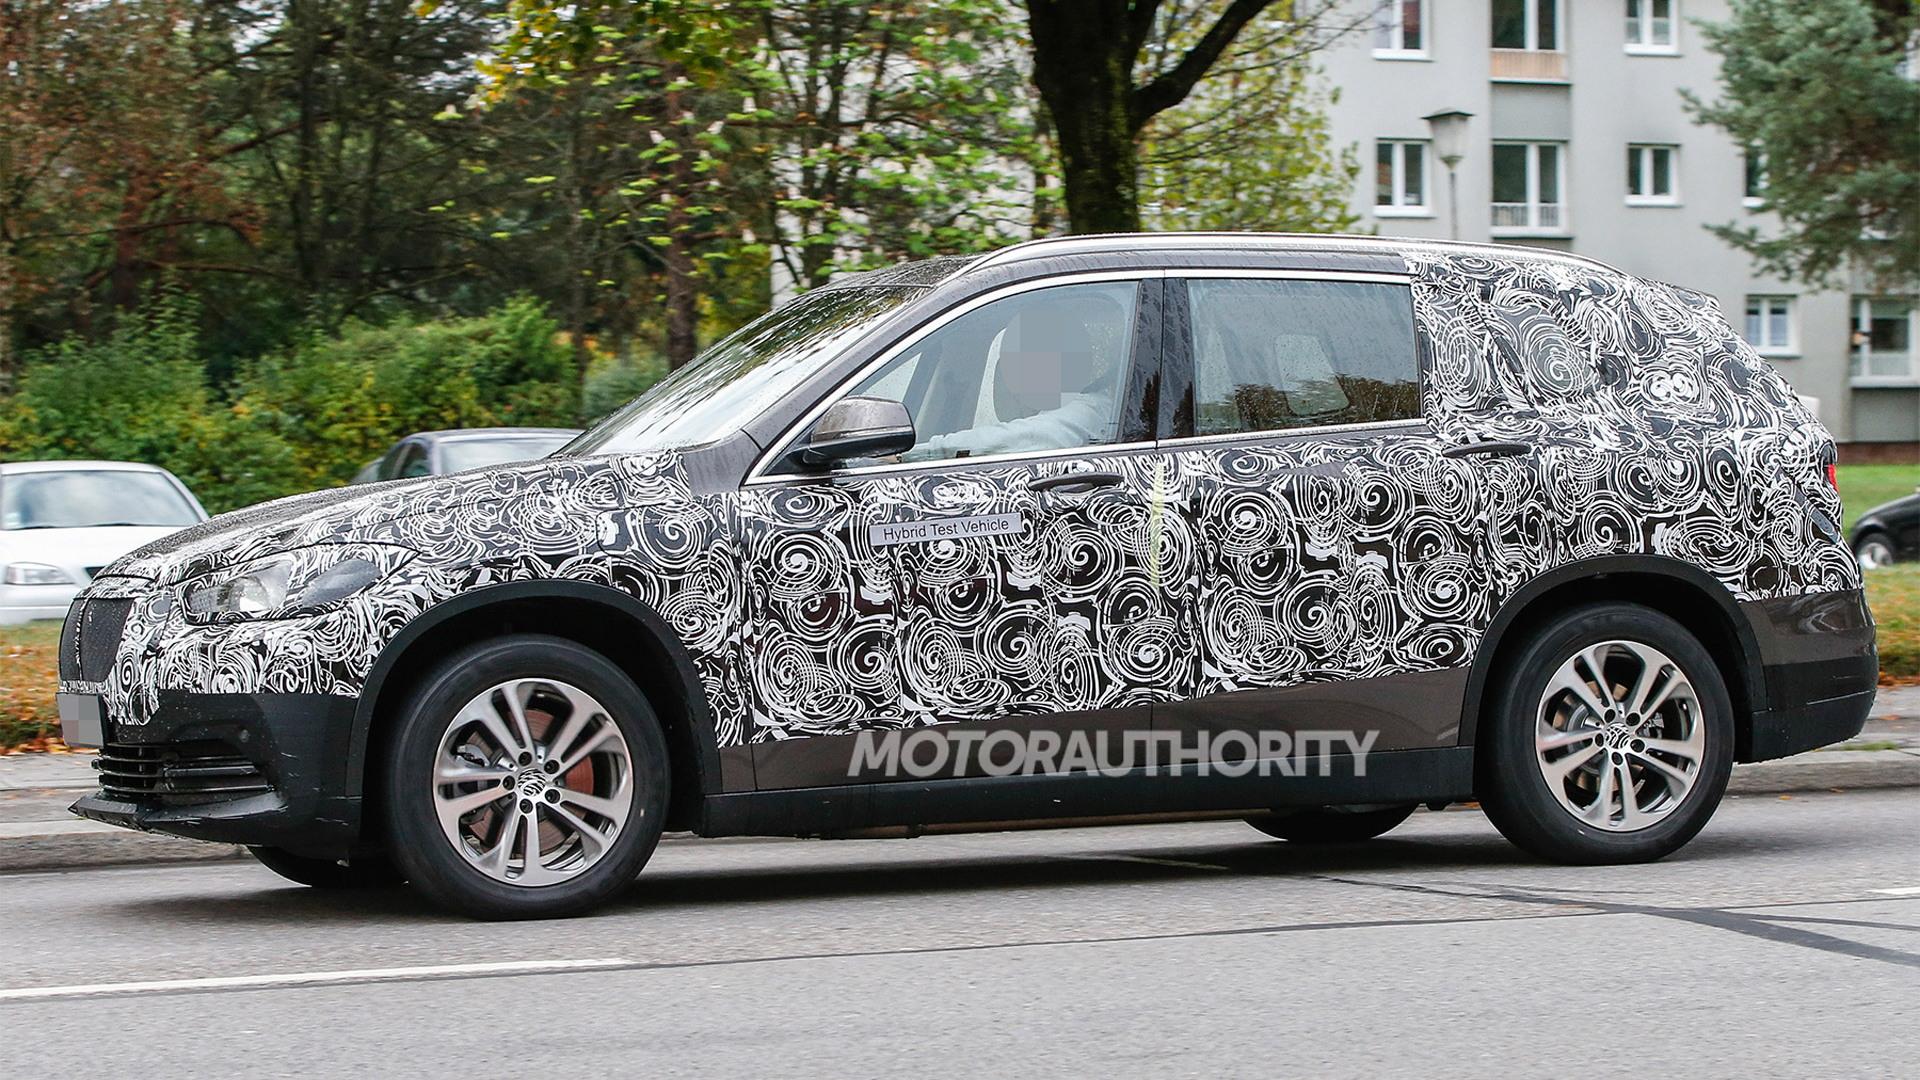 2016 BMW X1 seven-seater spy shots – Image via S. Baldauf/SB-Medien